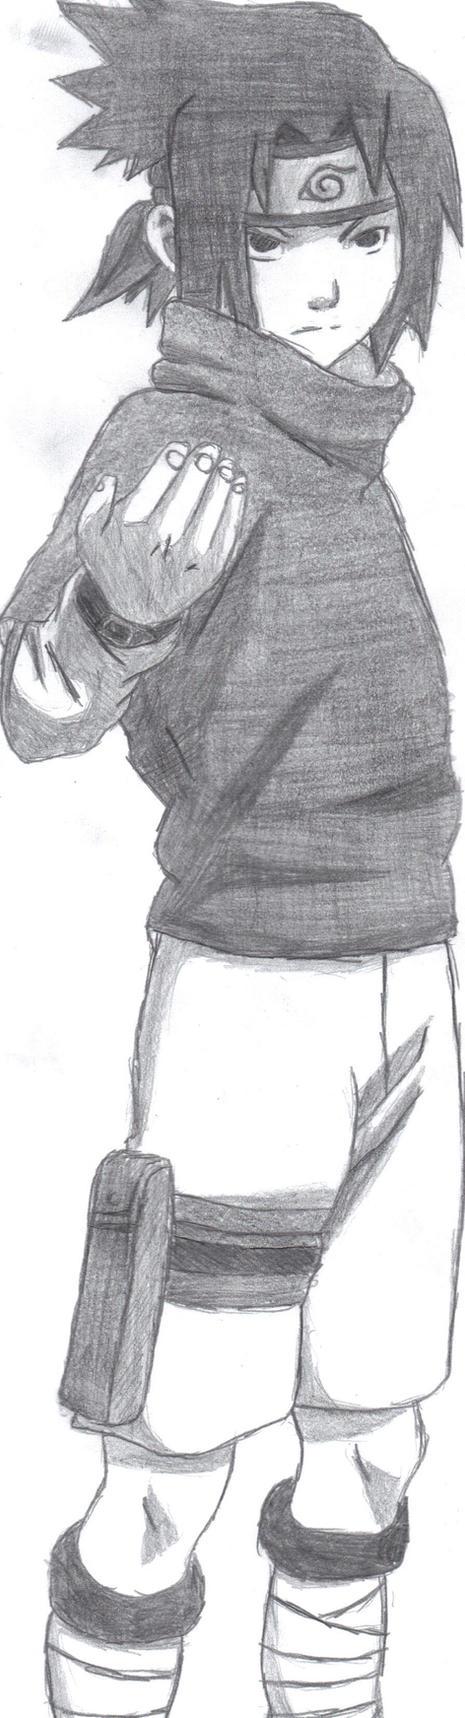 Sasuke Uchiha by AeliaDarkness on DeviantArt